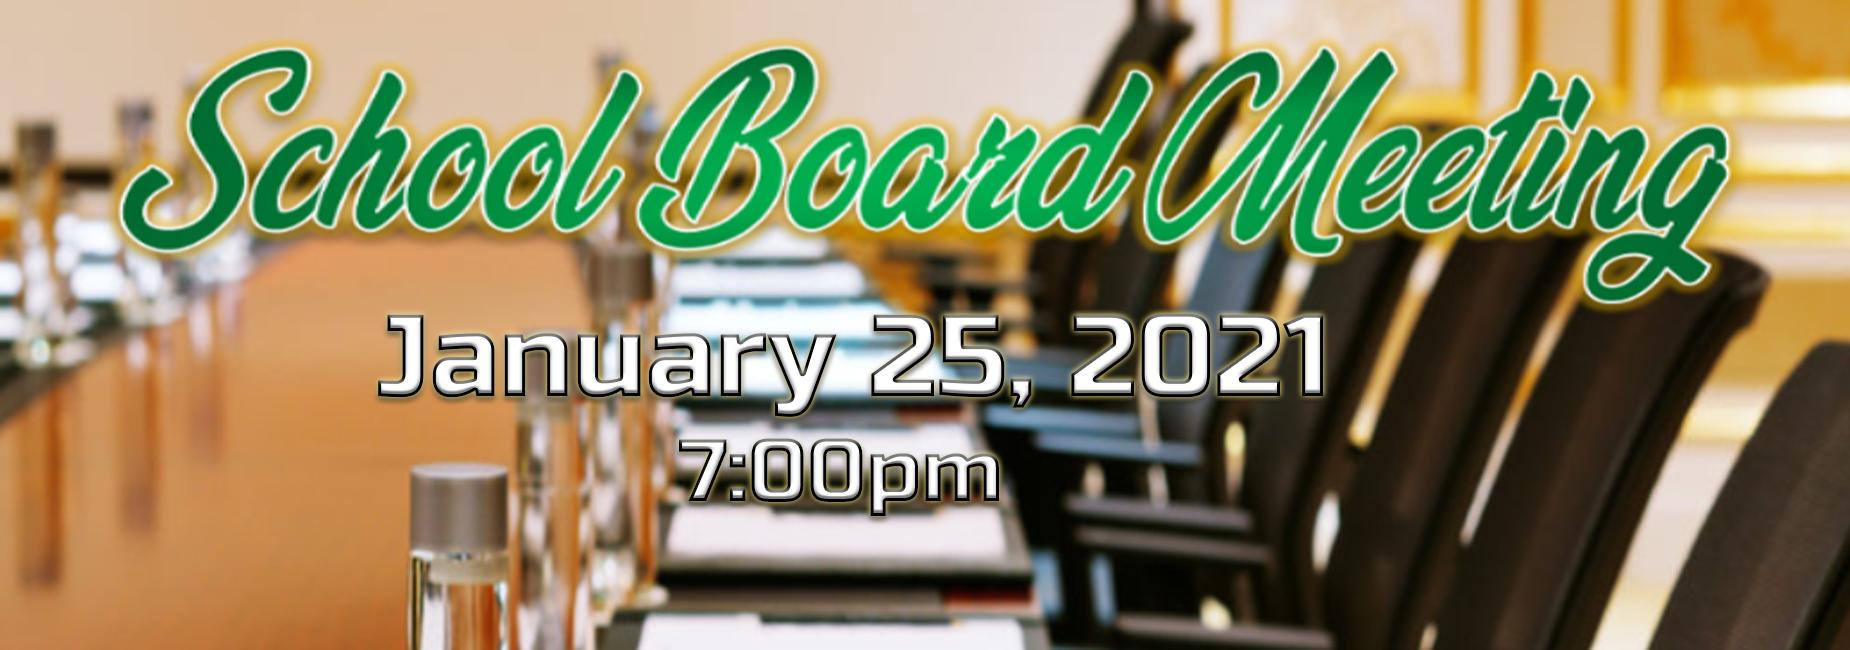 School Board Meeting January 21st 7:00pm